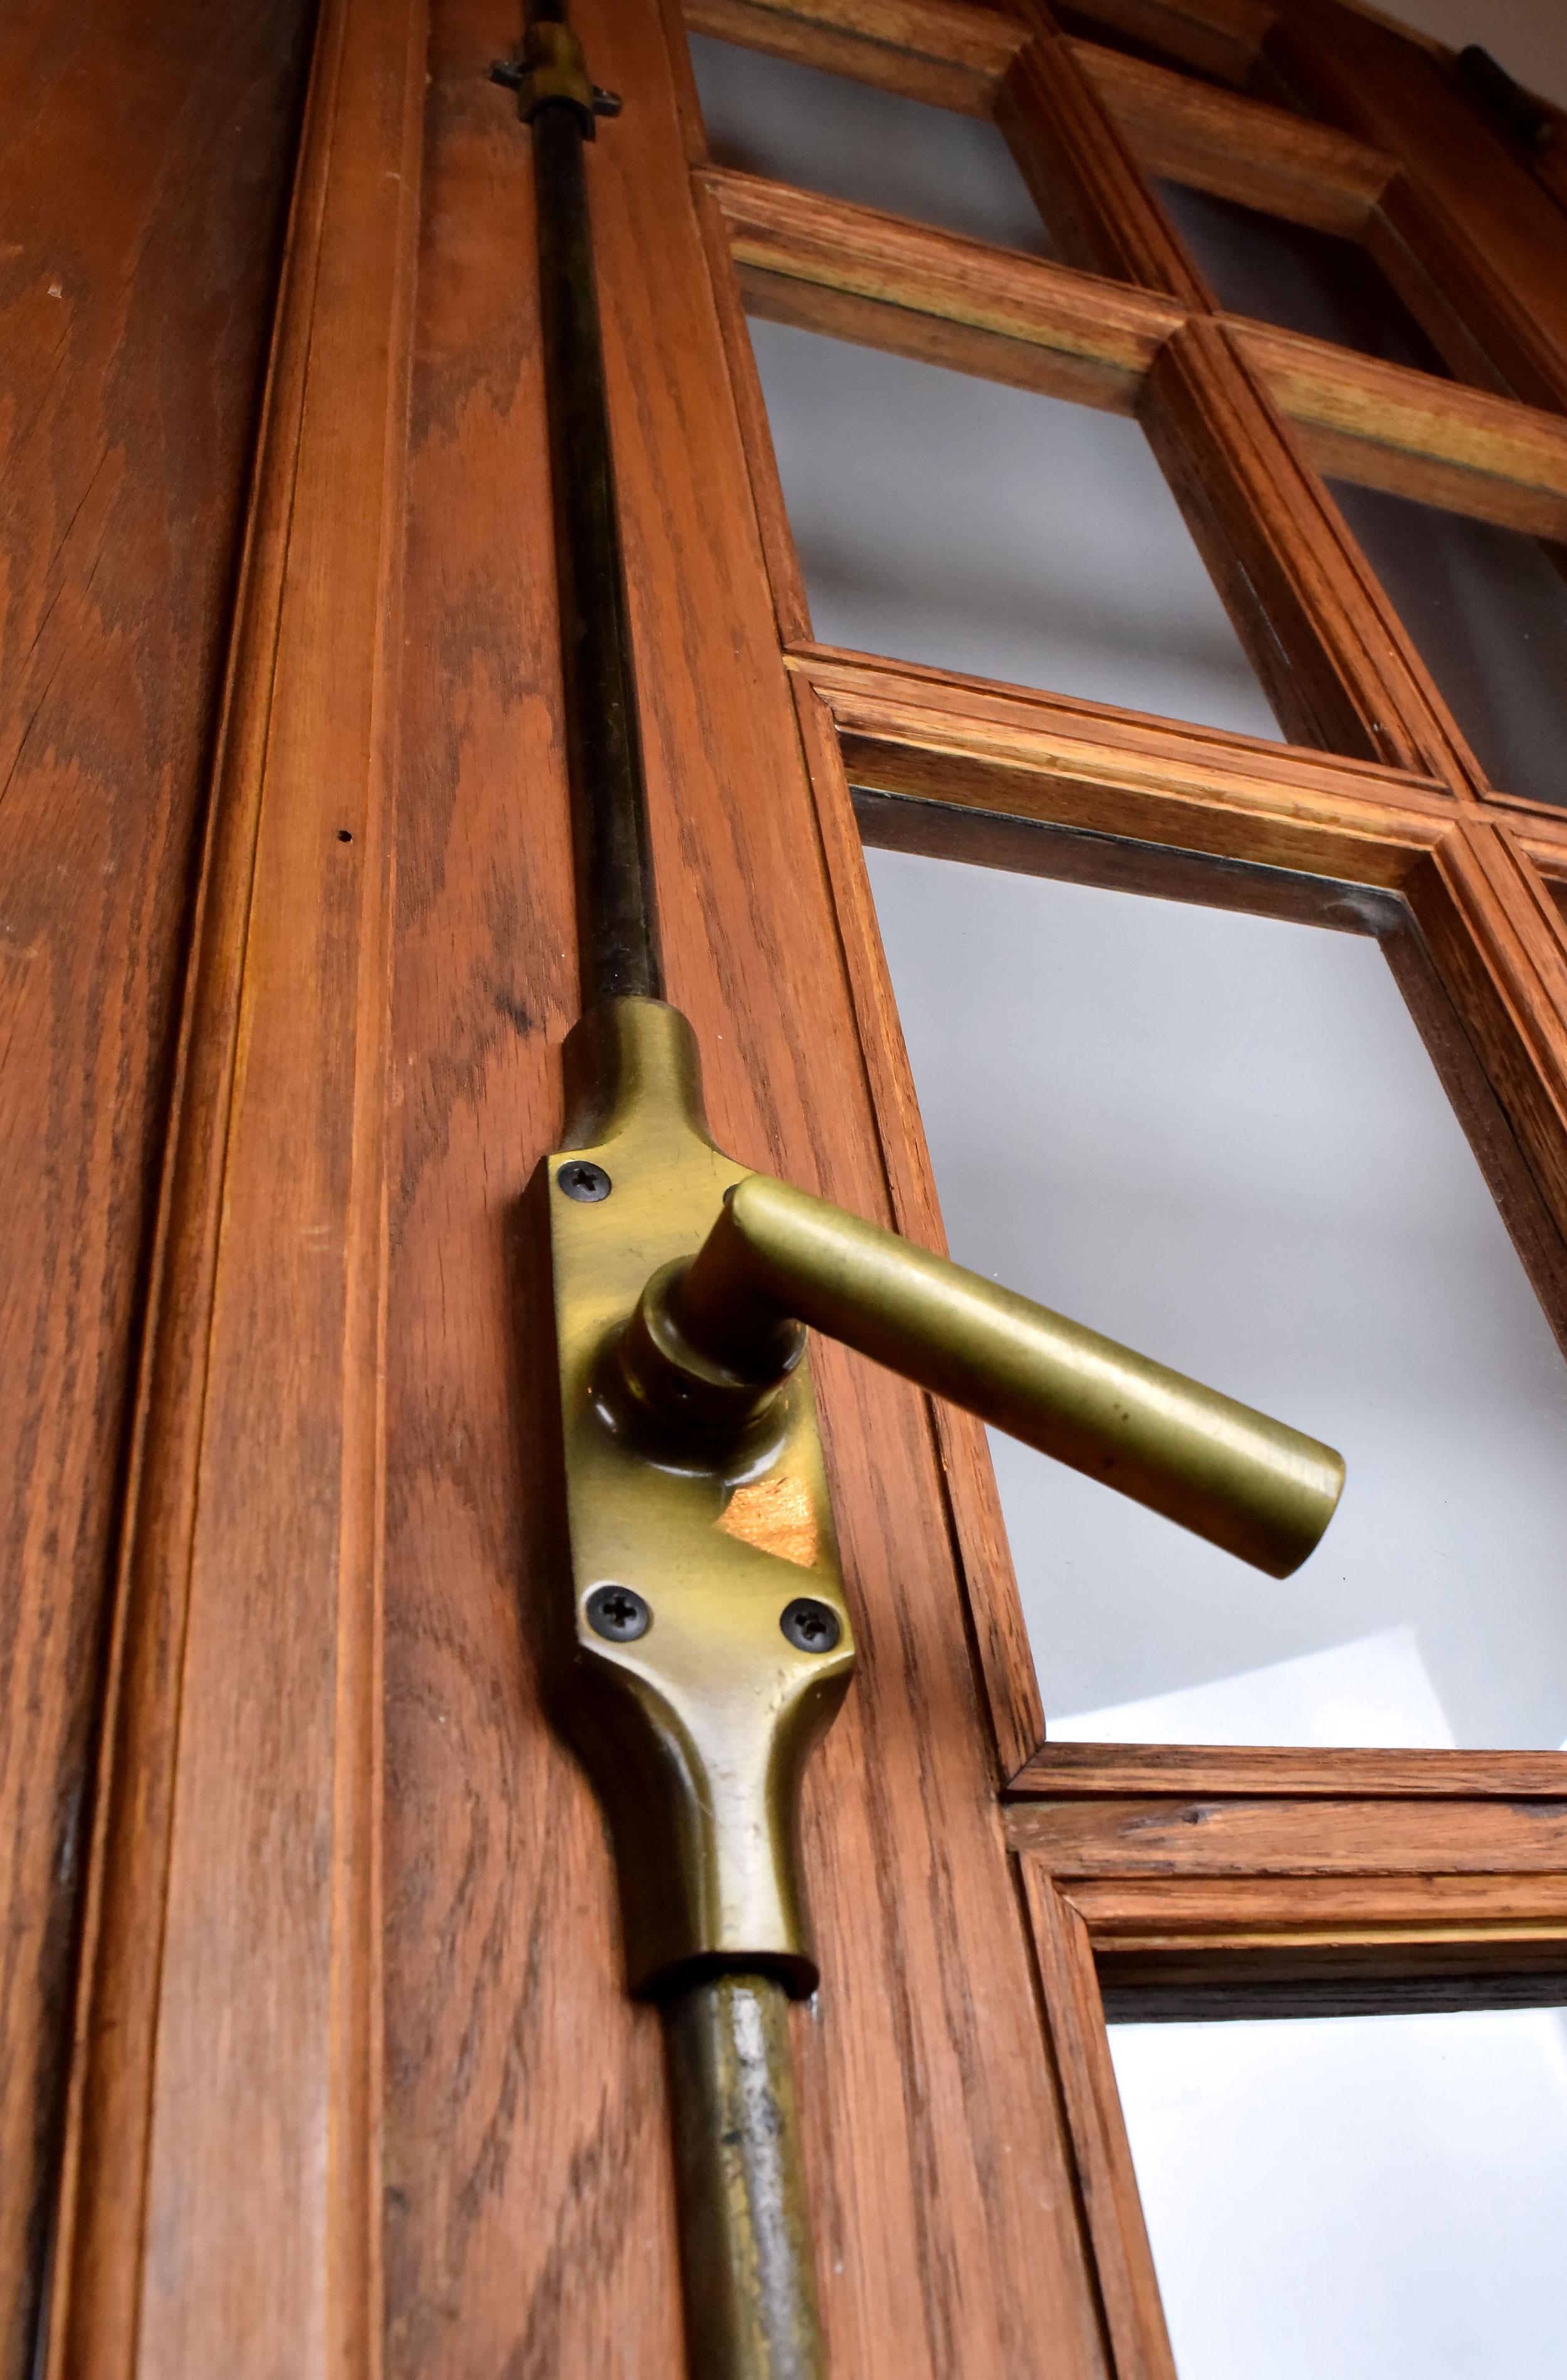 47088-arched-door-unit-handle-detail.jpg